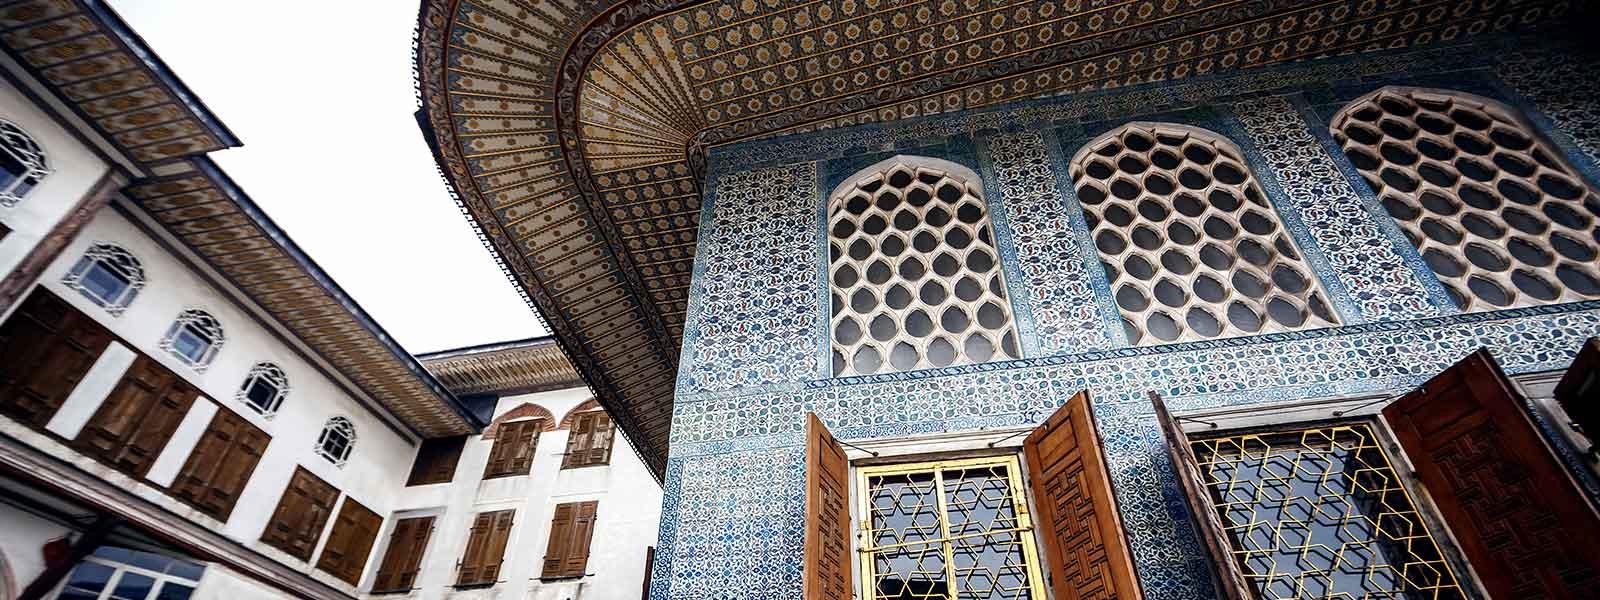 Topkapi Palace Museum, Istanbul Turkey